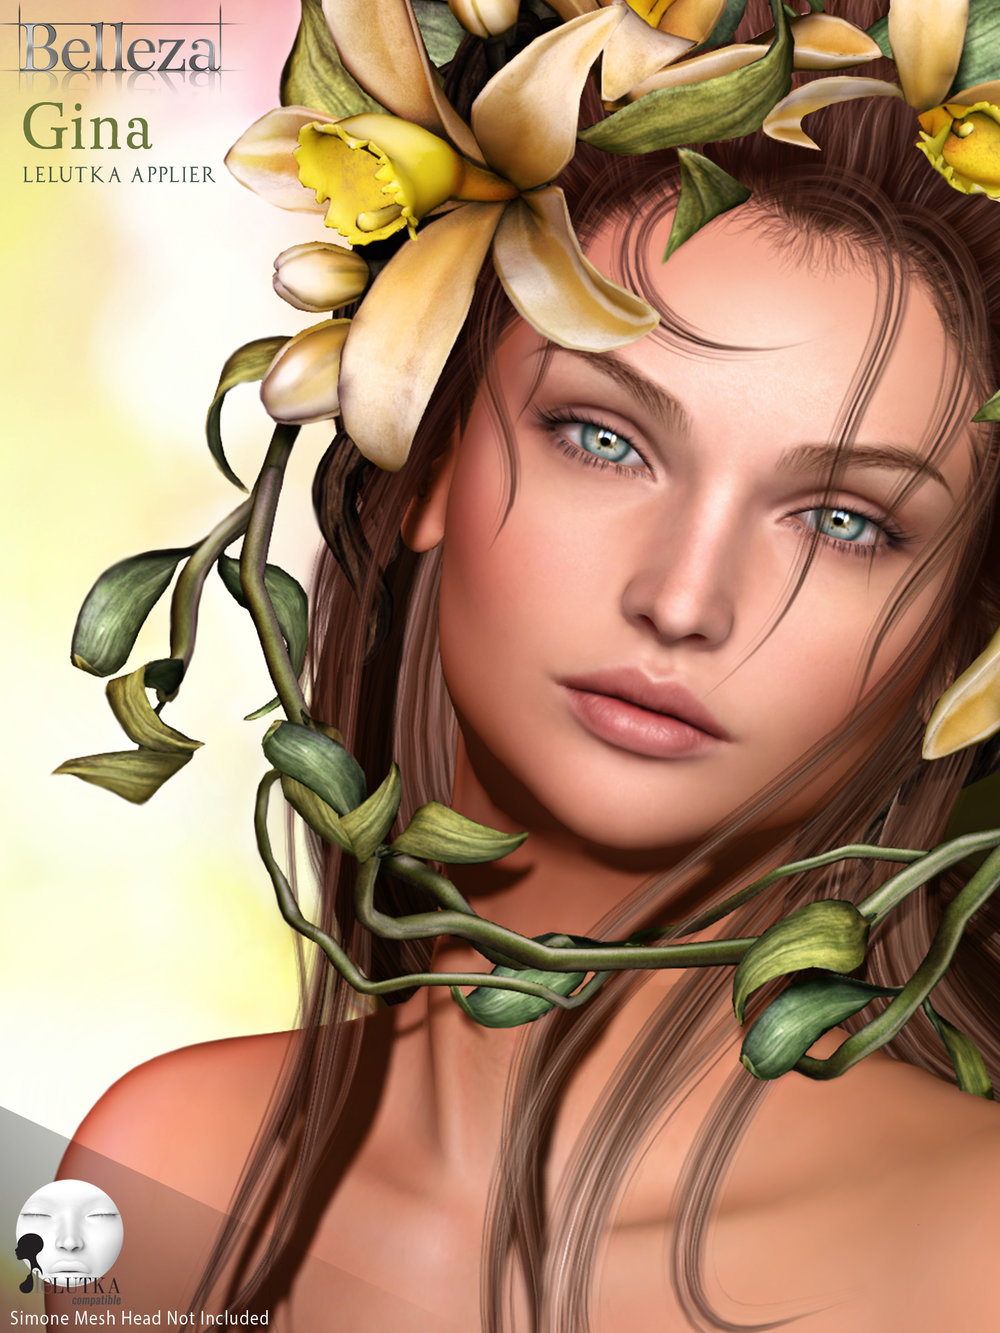 -Belleza- Gina Lelutka Applier.jpg